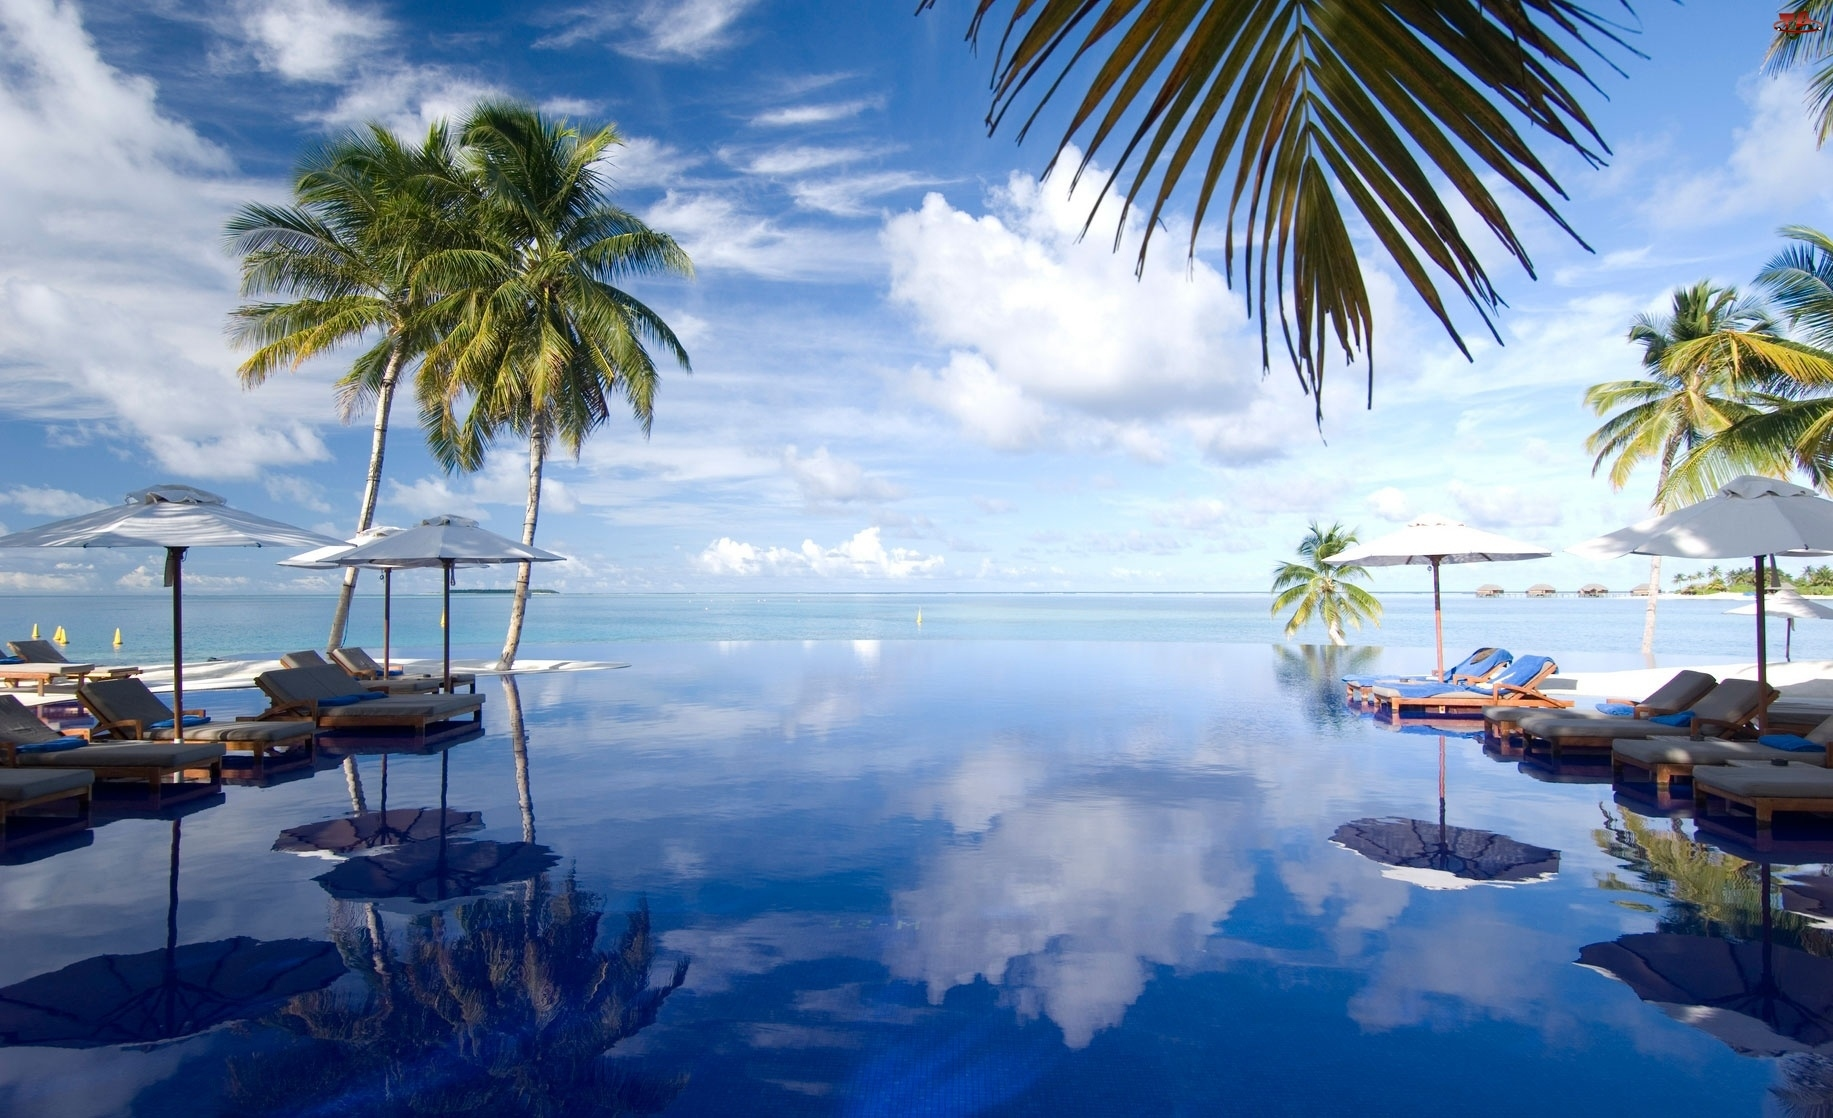 Morze, Malediwy, Parasole, Palmy